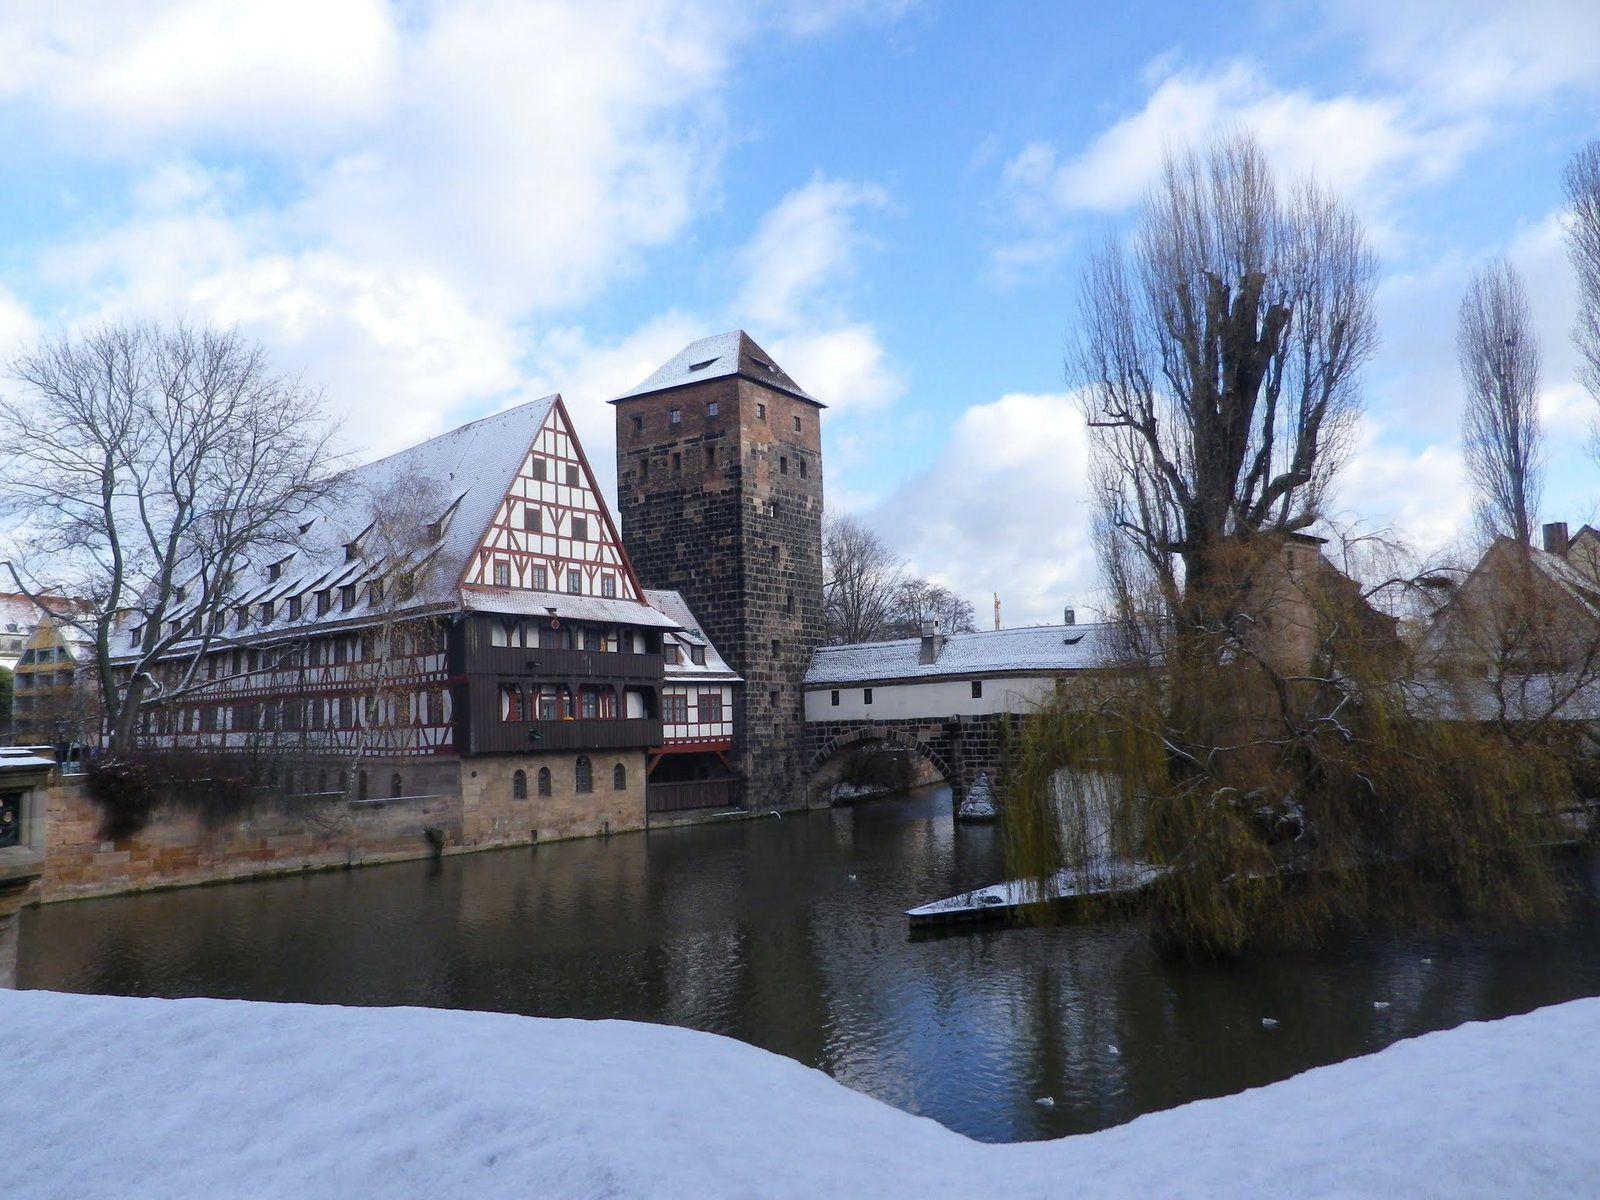 2 - Emilie-Lise à Nuremberg 2017